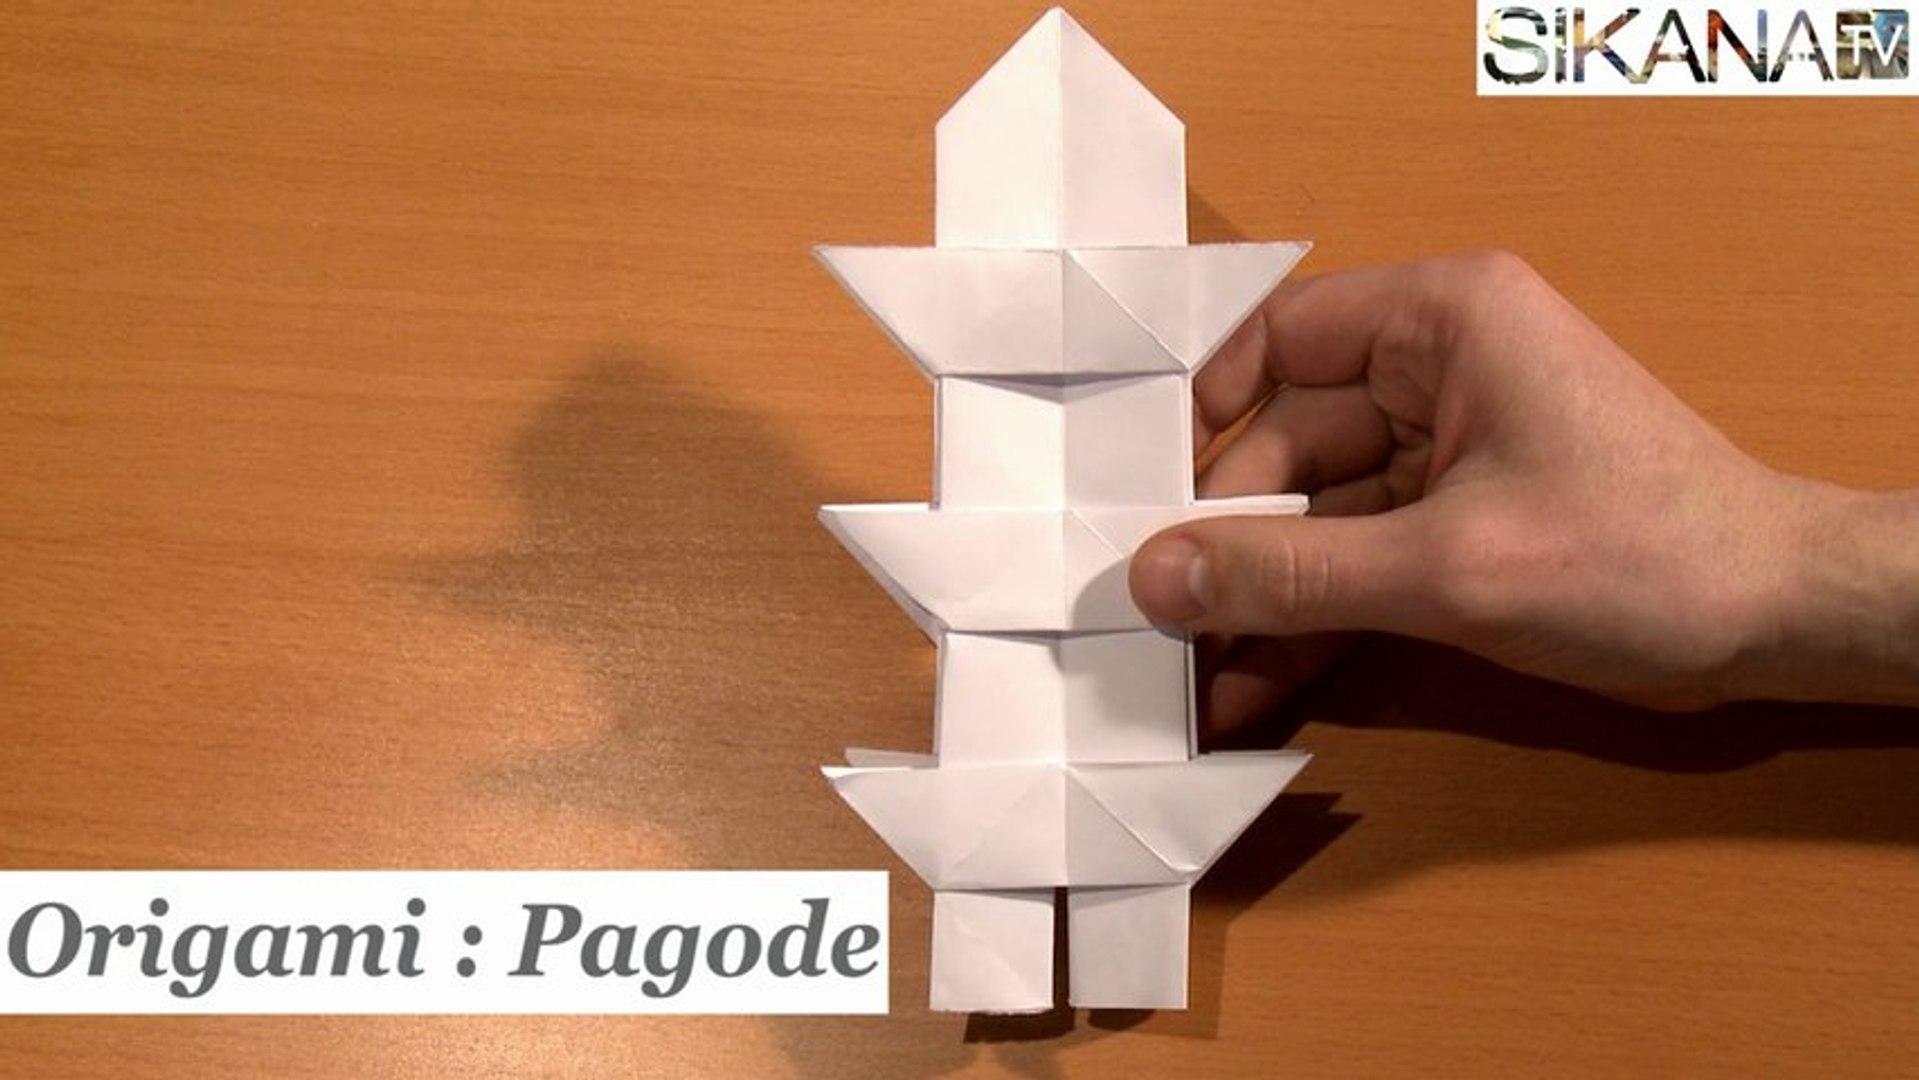 Origami traditionnel : La pagode en papier